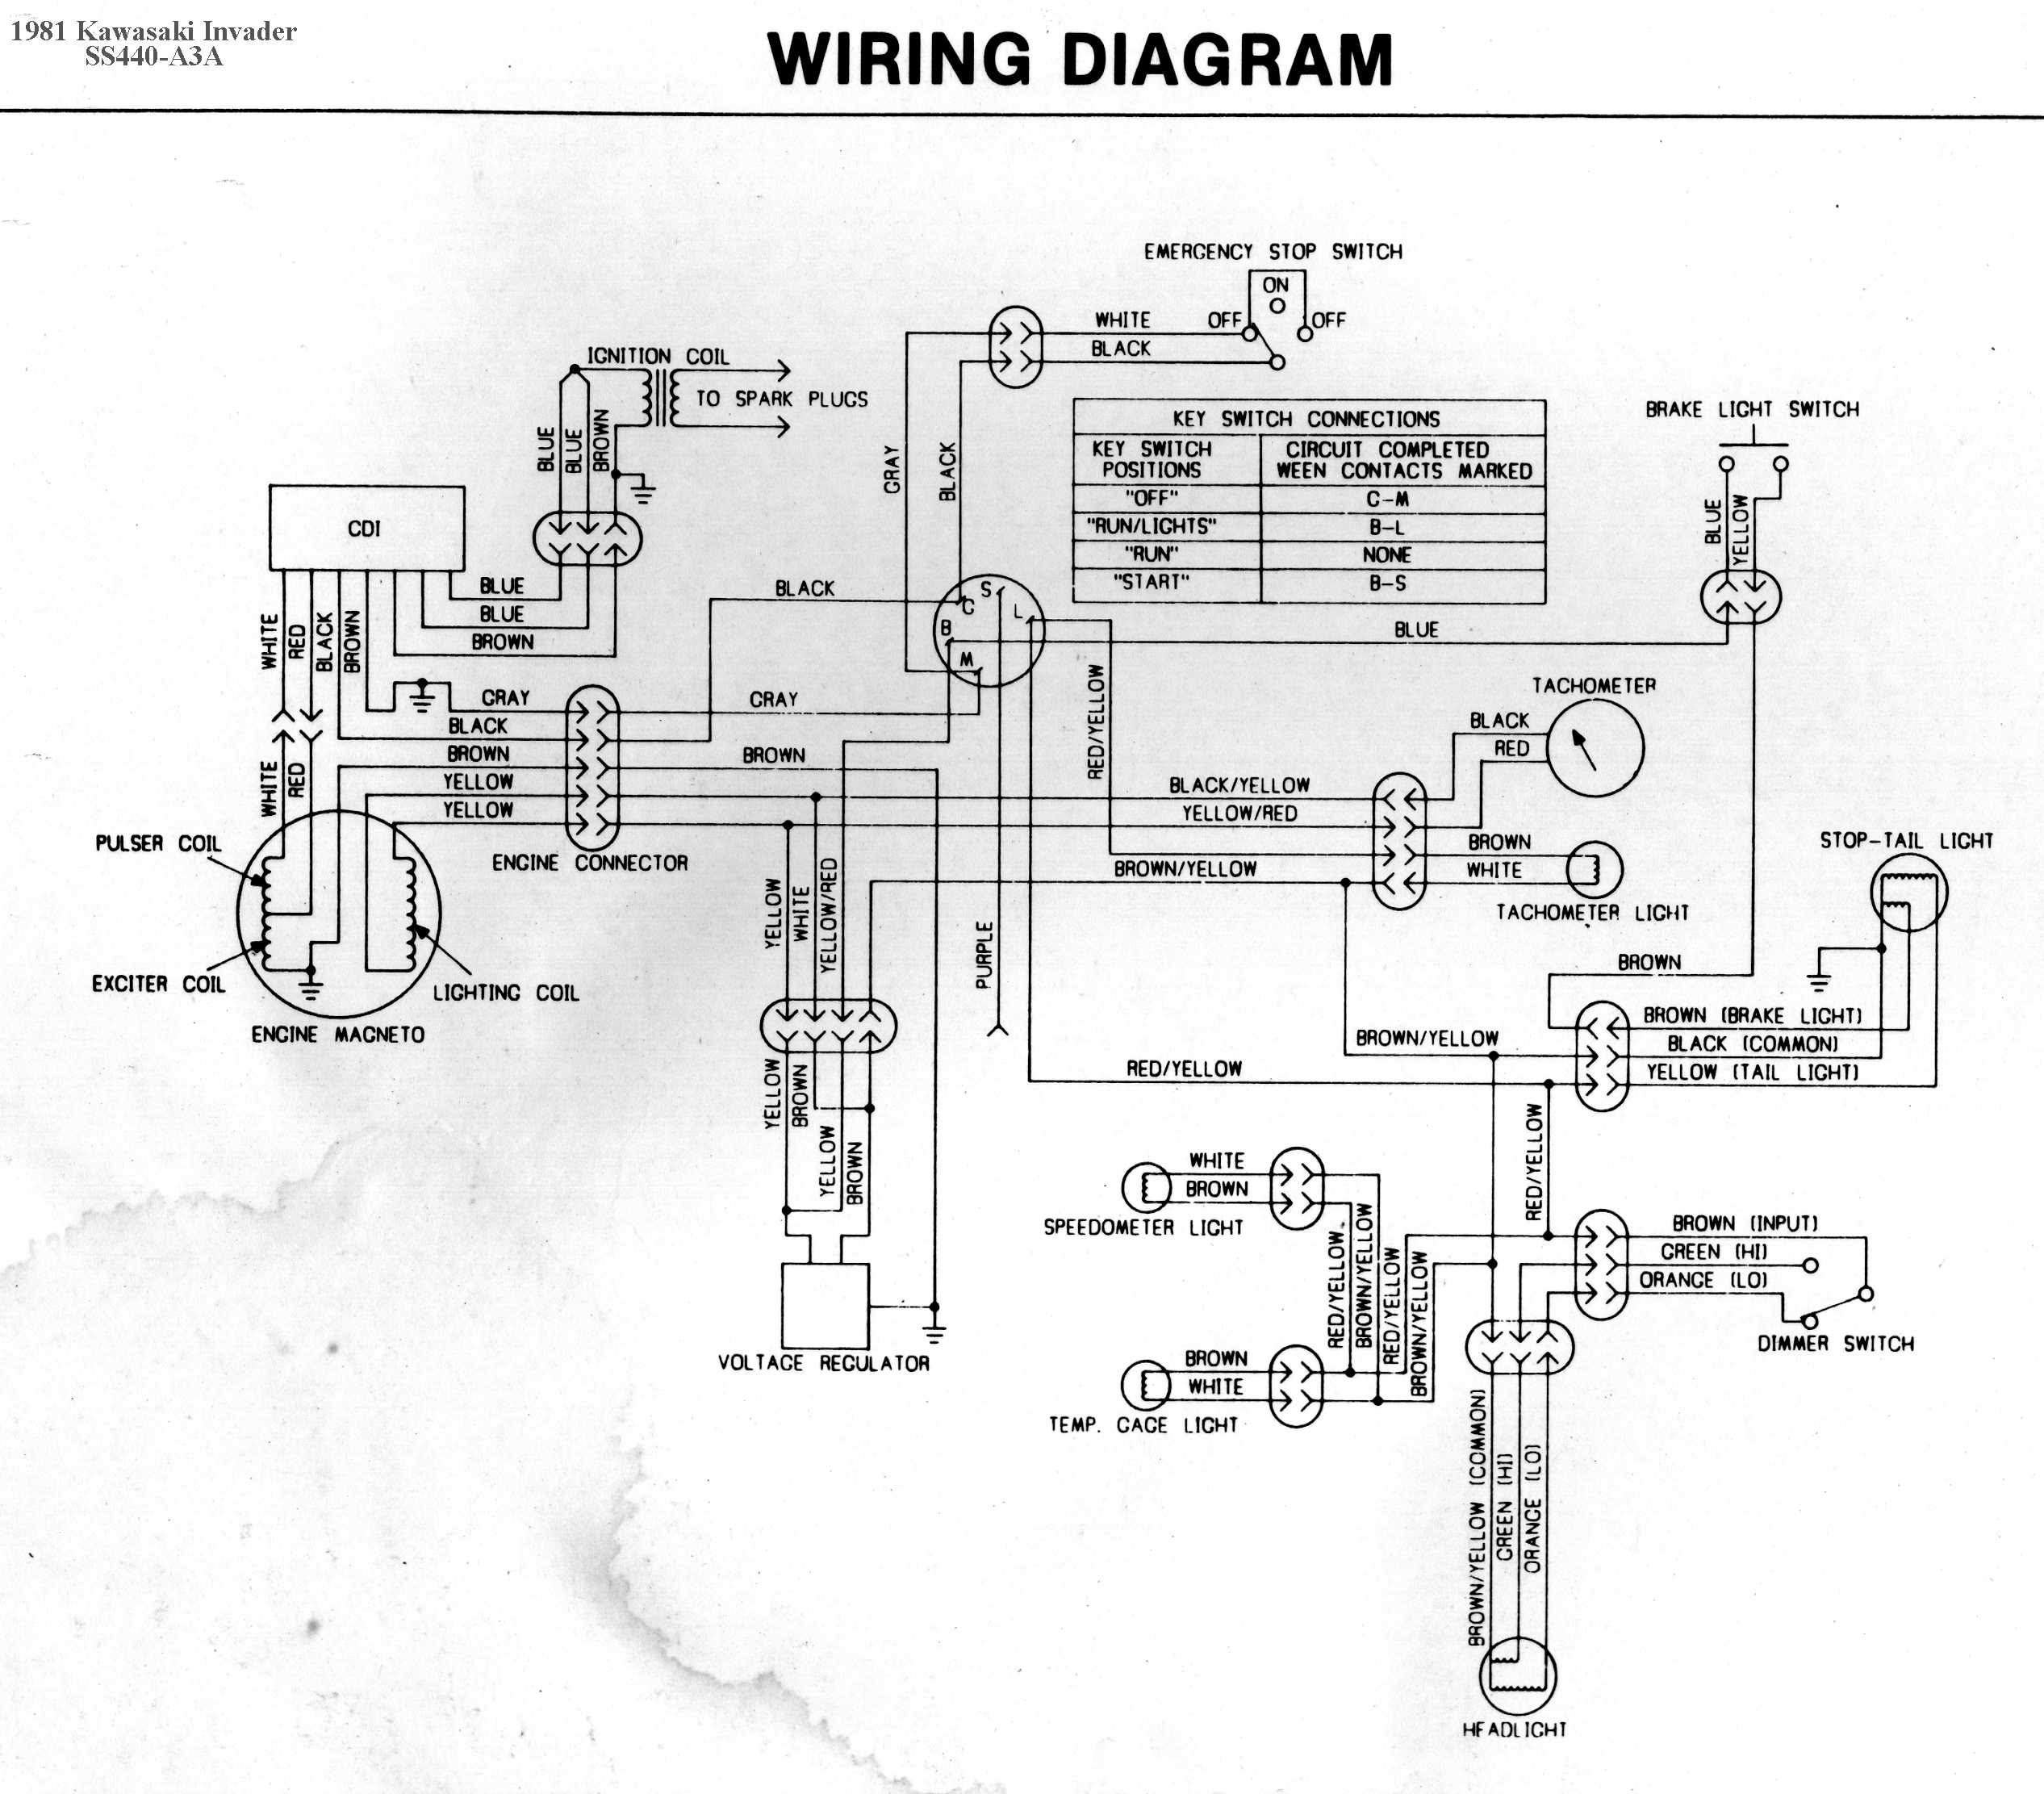 1998 Yamaha Waverunner Diagram Wiring Schematic 2008 Volvo C70 Fuse Box Ace Wiring Yenpancane Jeanjaures37 Fr